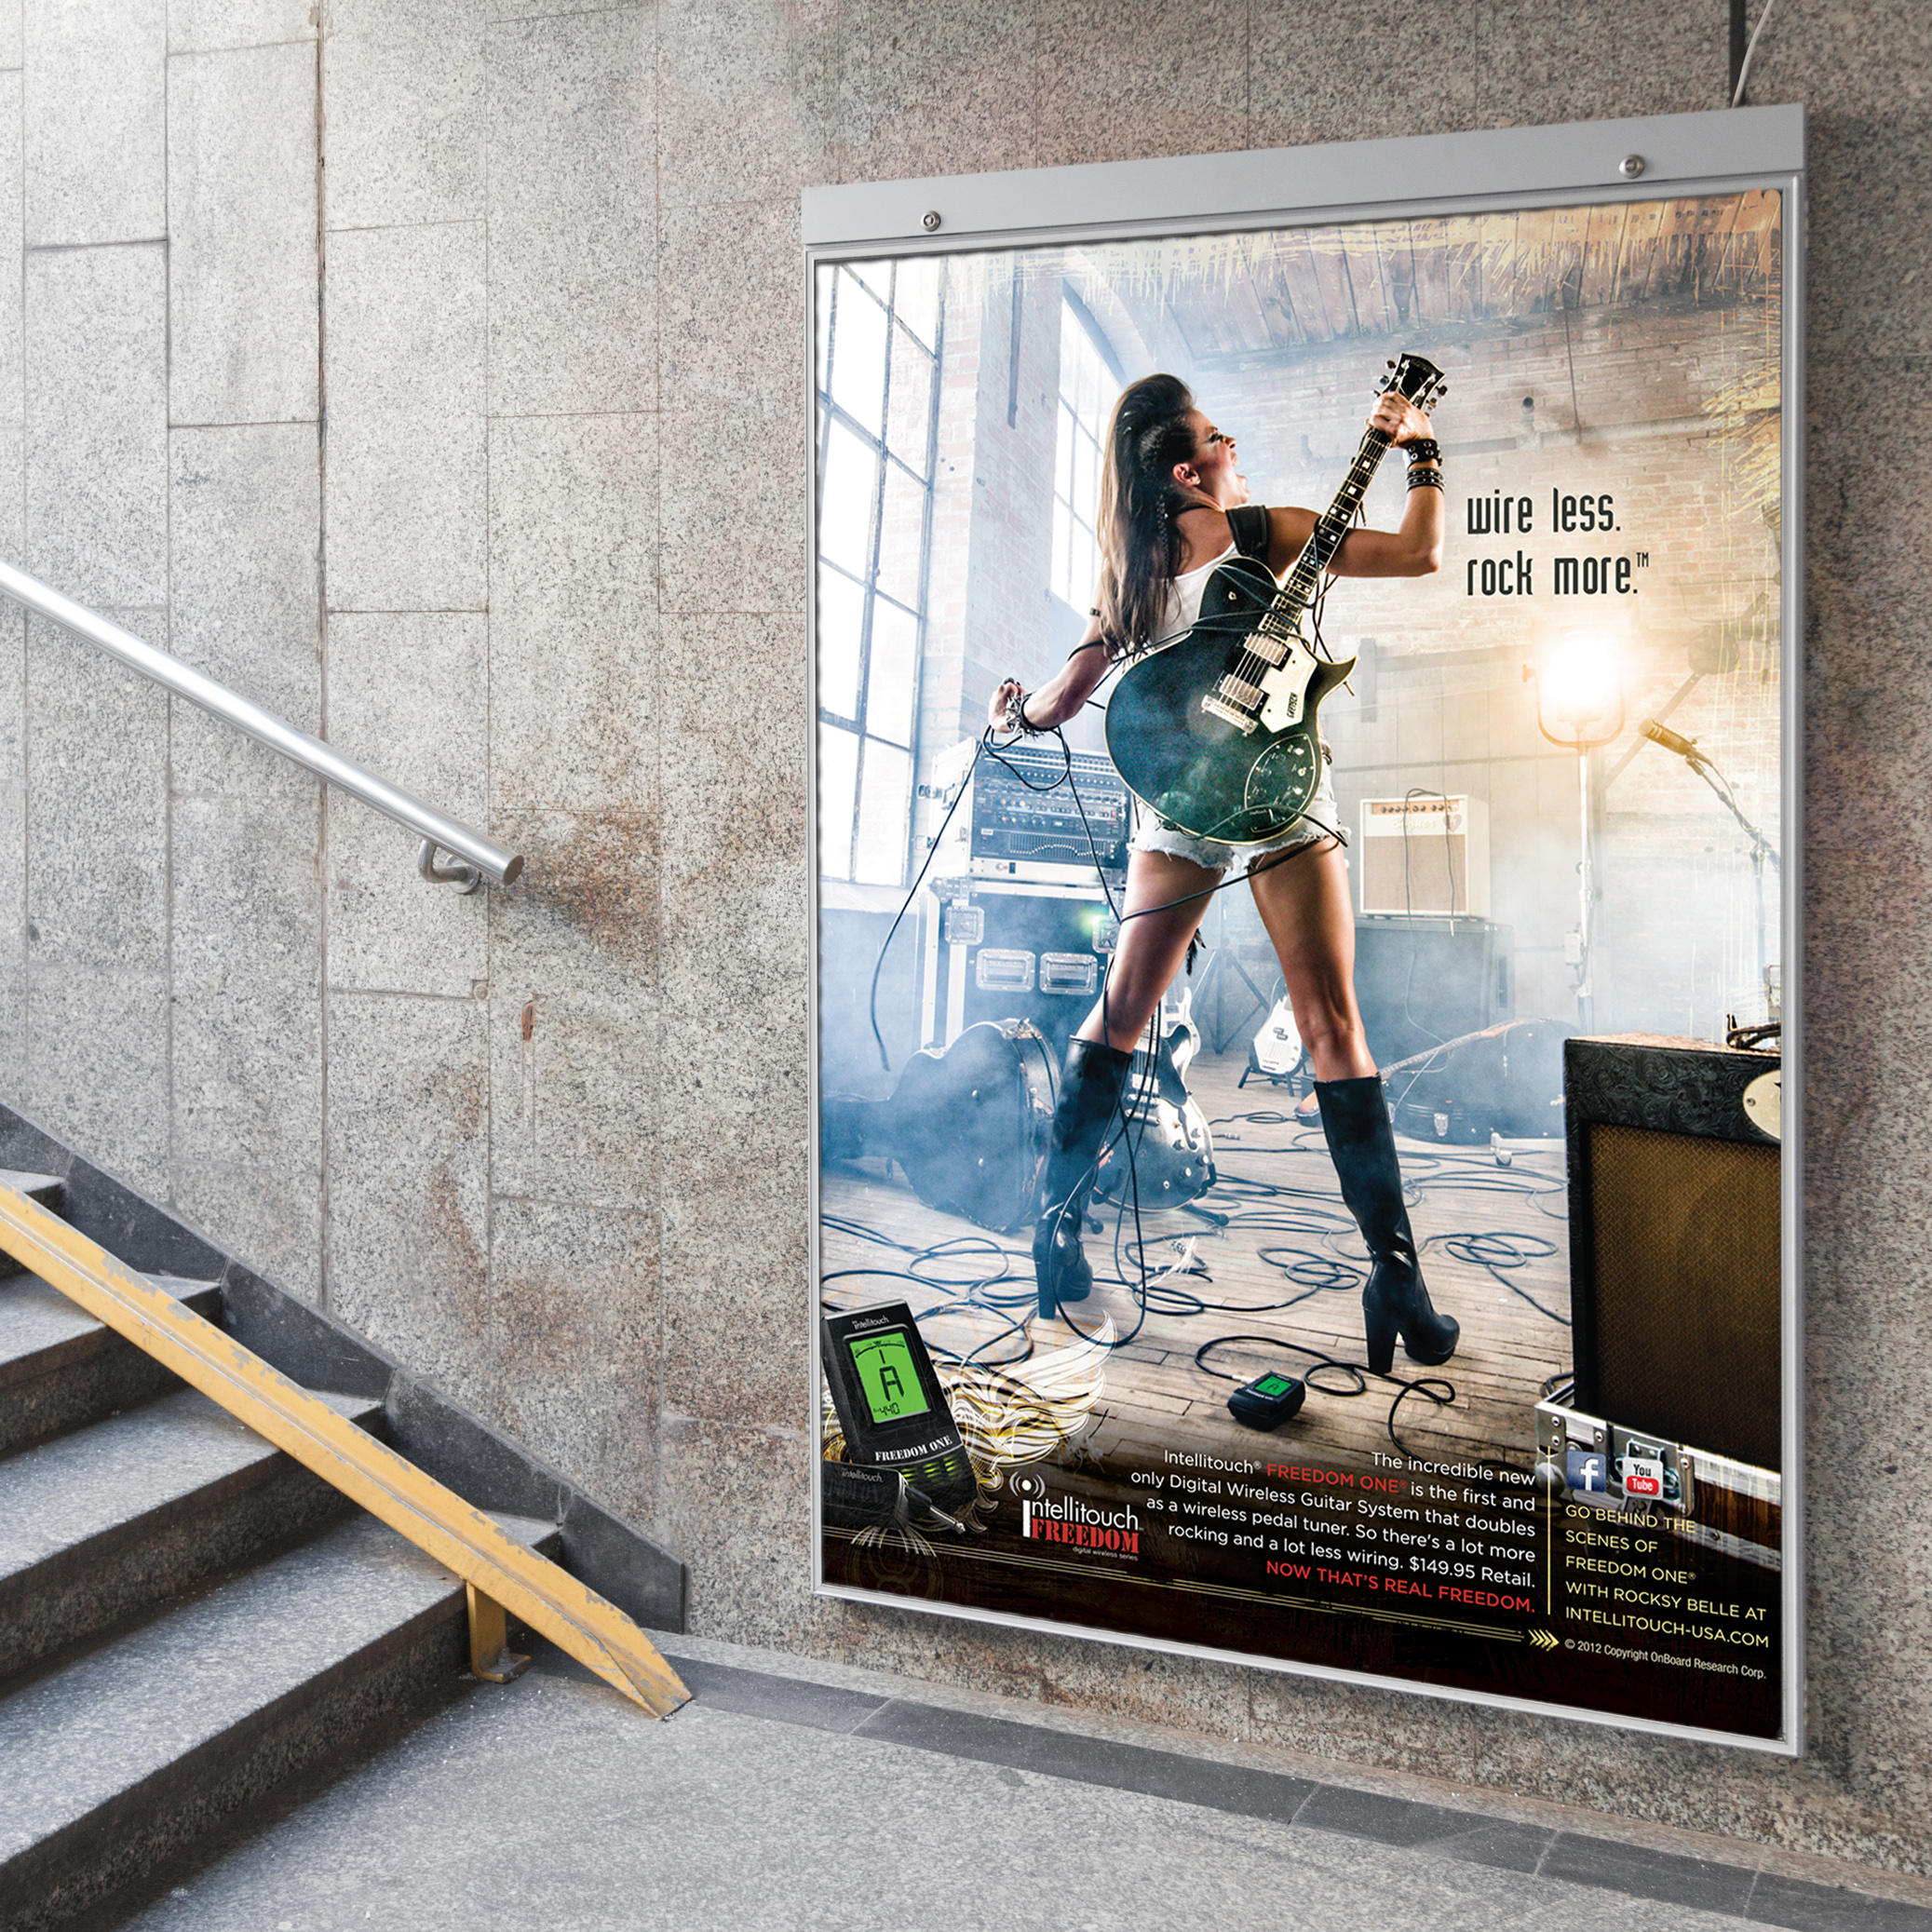 Tuner_Stairway_Ad.jpg